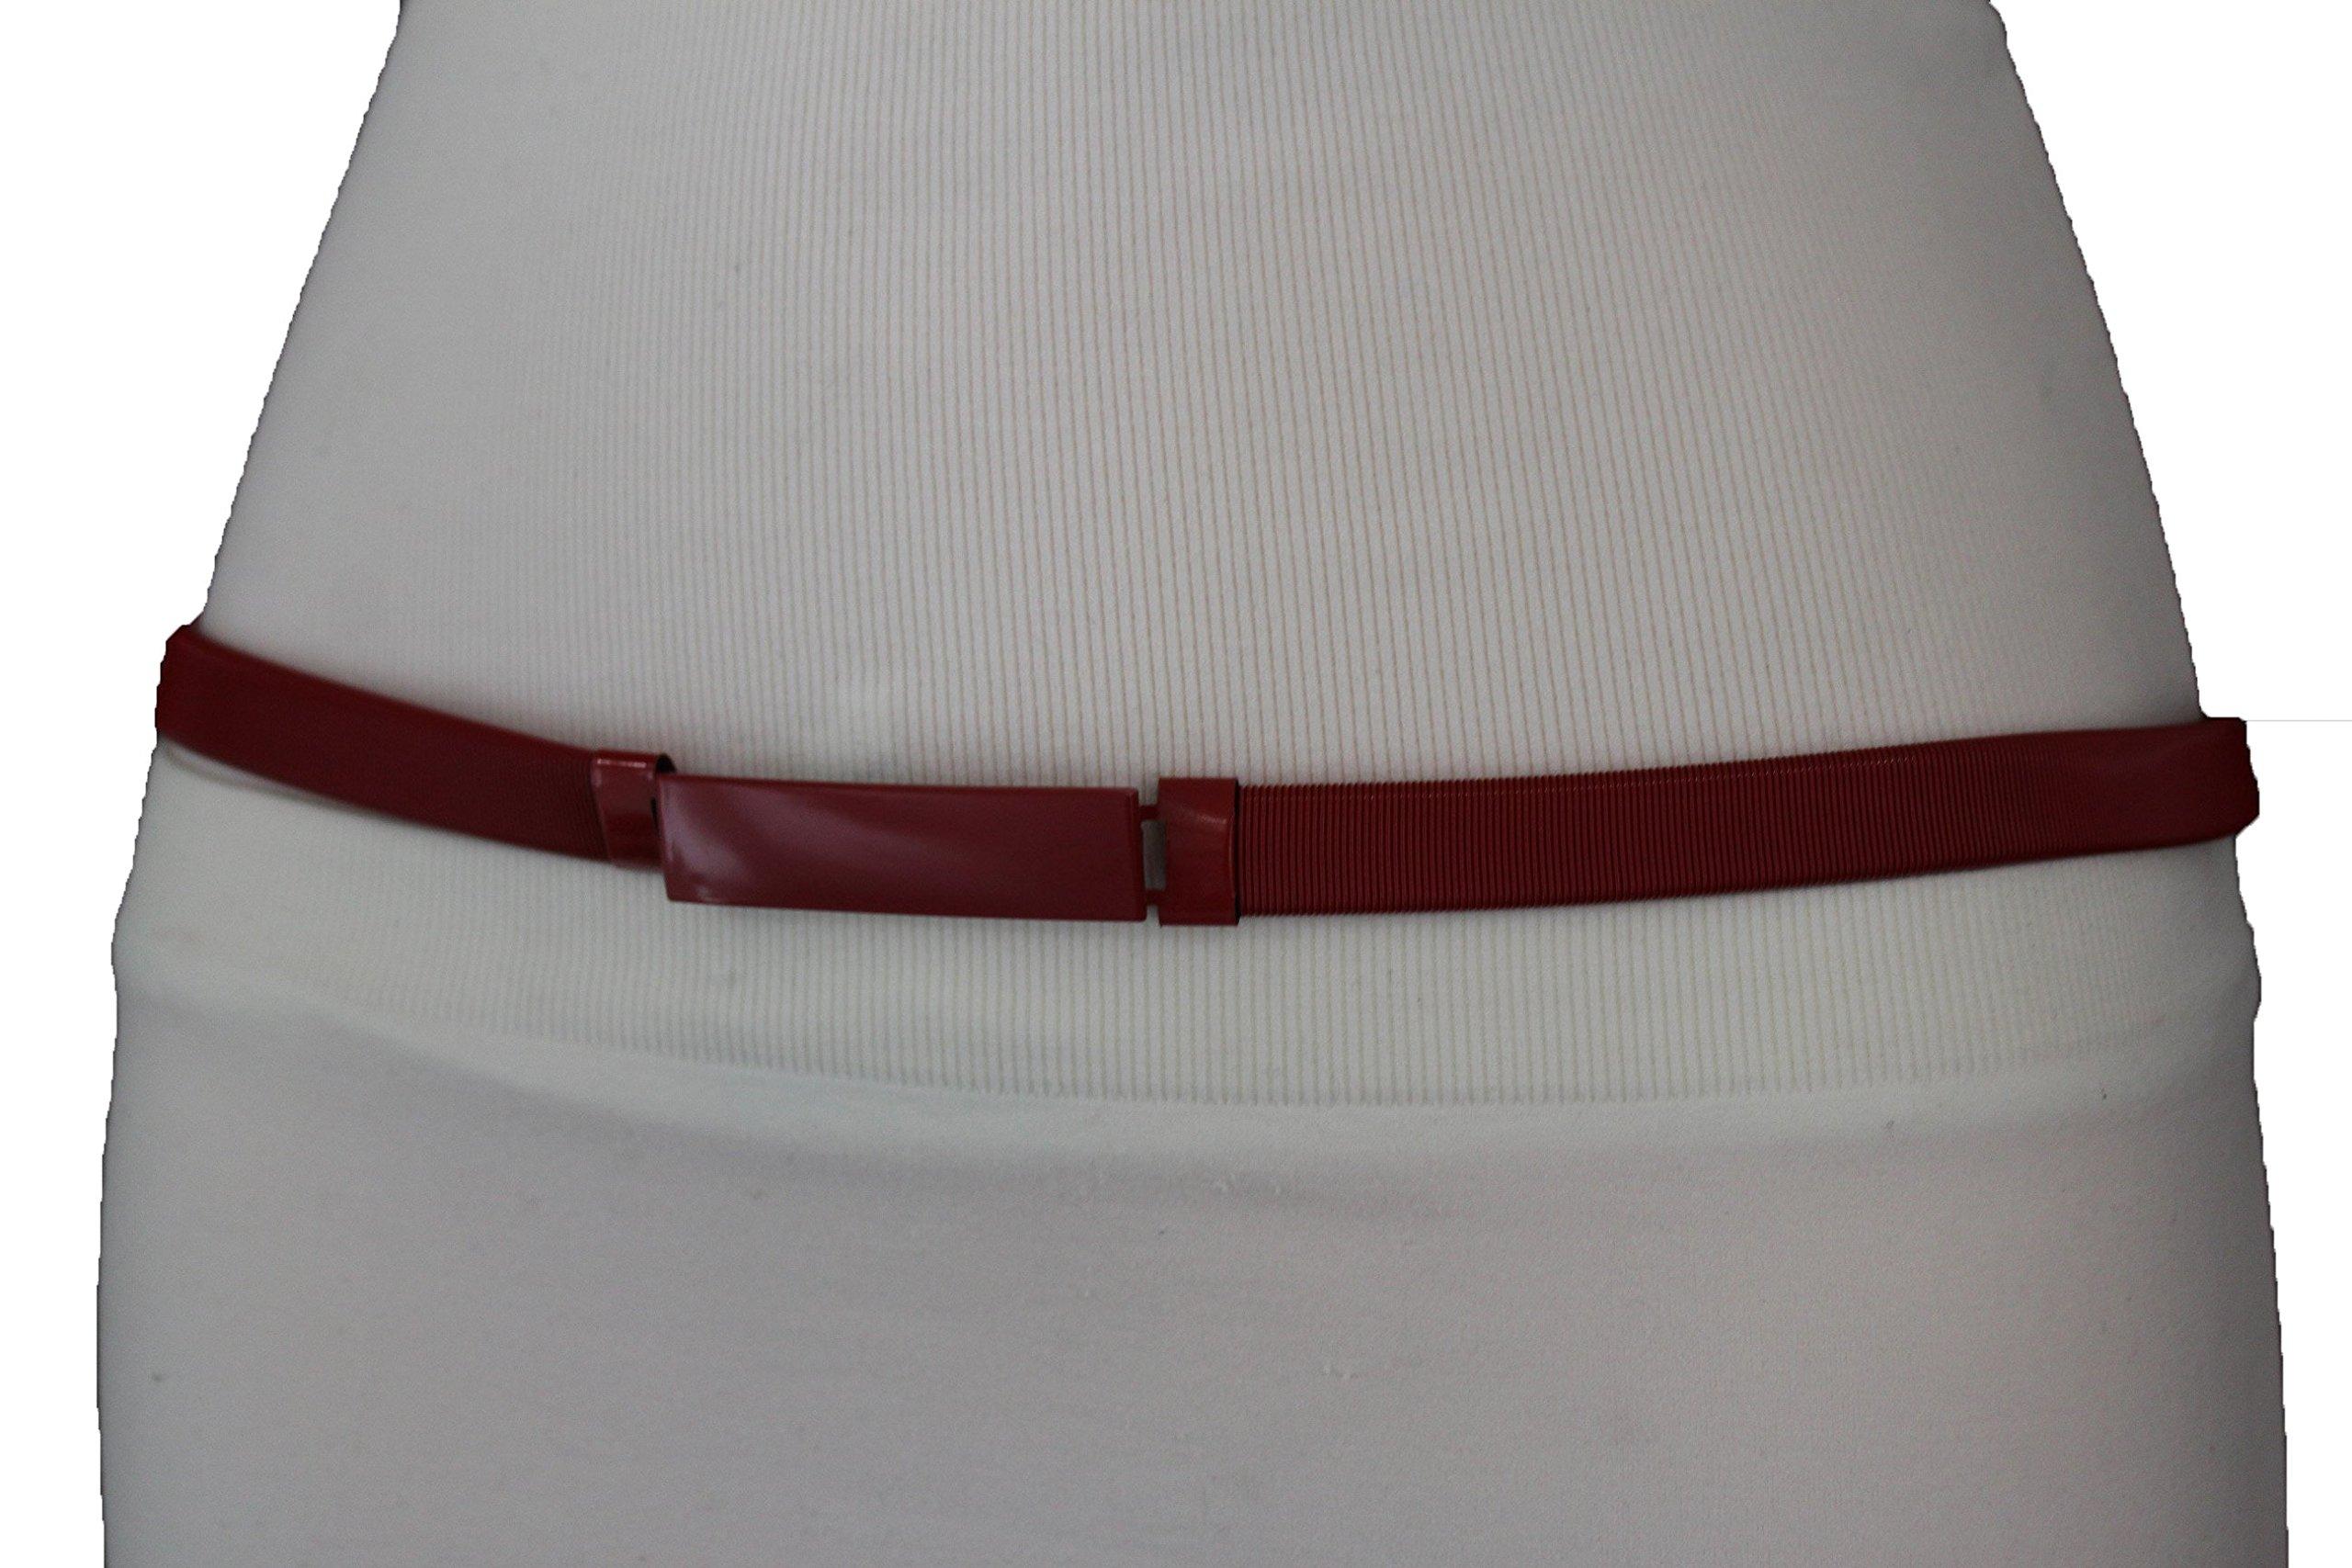 TFJ Women's Fashion Belt Hip Waist Elastic Metal Band Plus Size M L XL Red